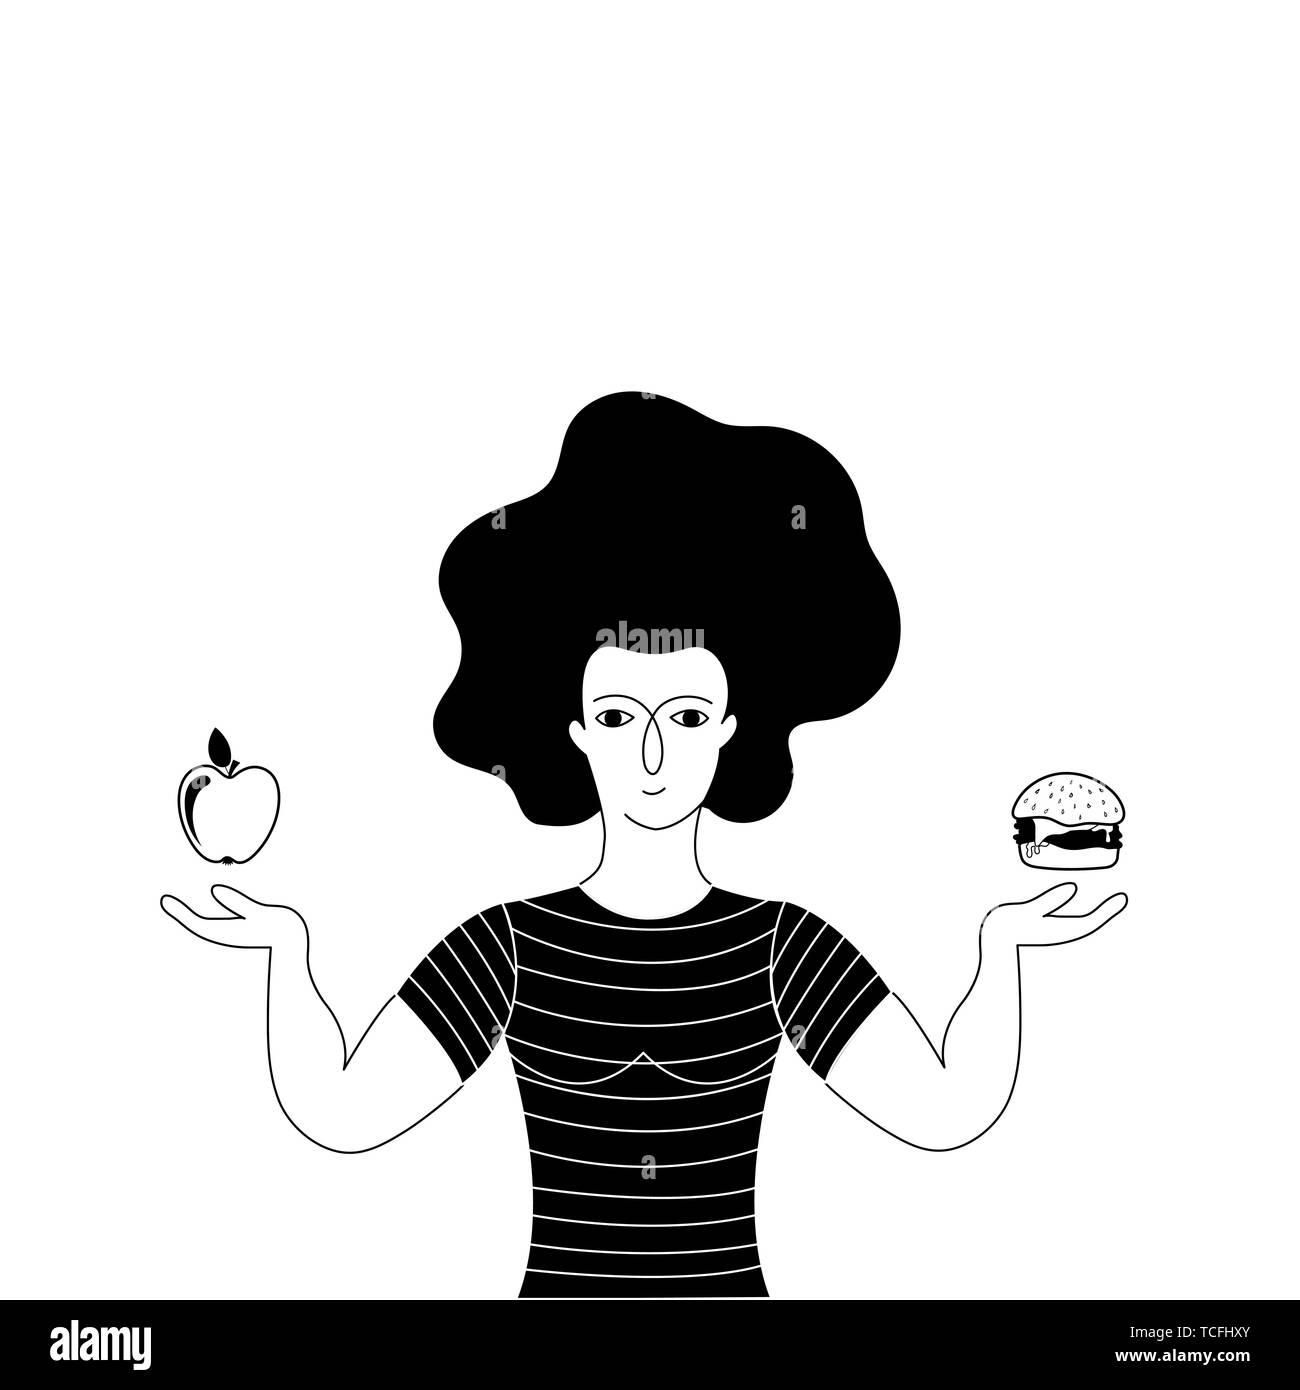 A woman chooses between a hamburger and an apple. Unhealthy vs healthy food. Hand drawn vector illustration. - Stock Image